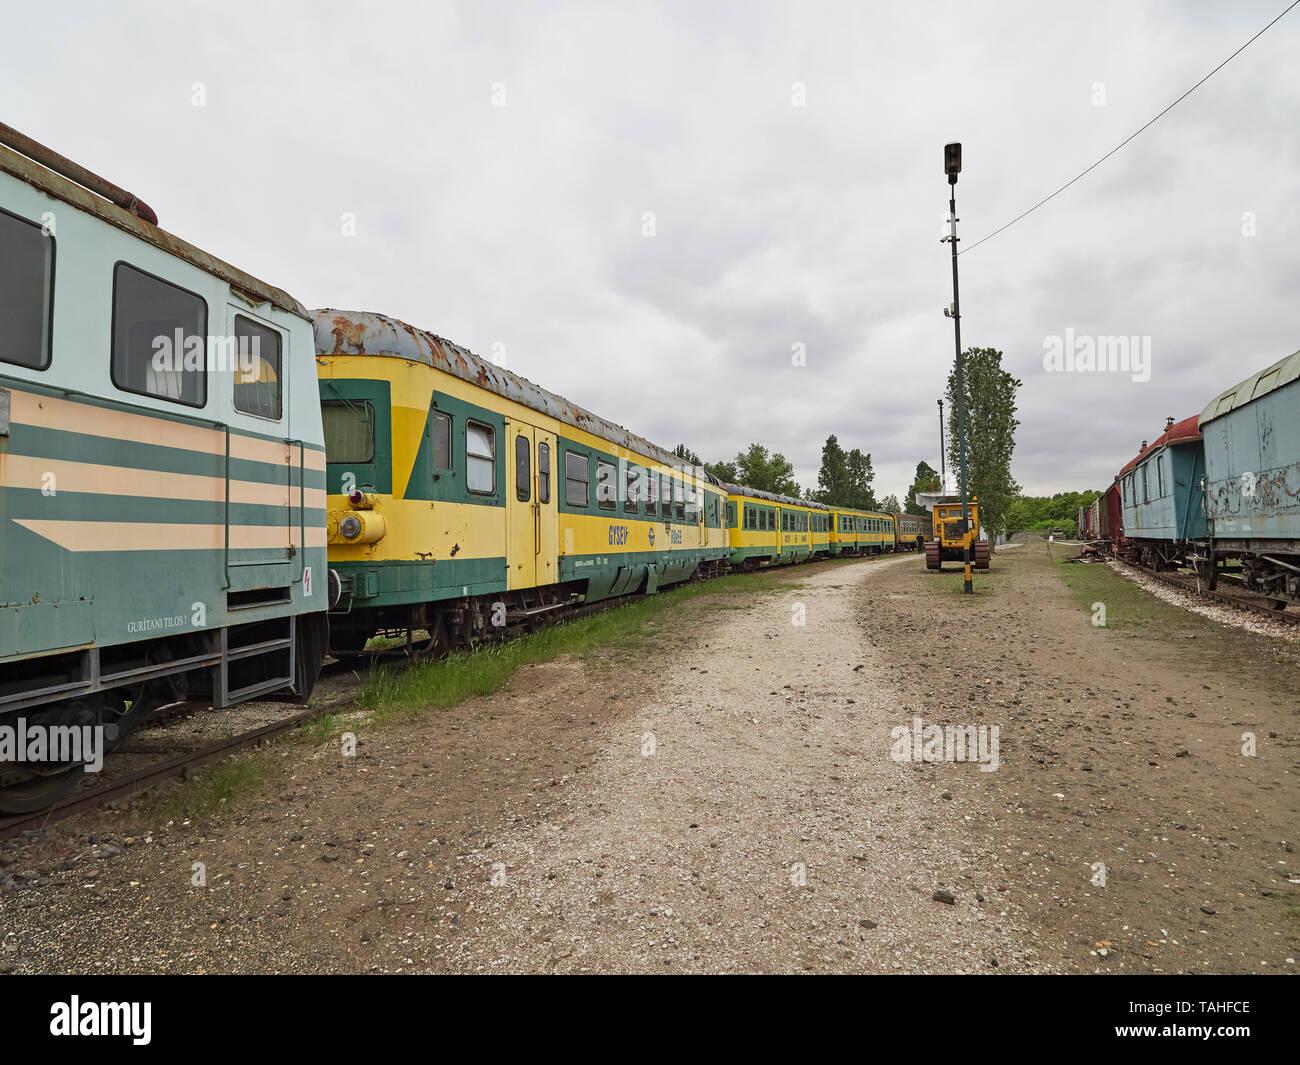 The Magyar Vasúttörténeti Park Hungarian Railway History Park commuter train Budapest Hungary - Stock Image